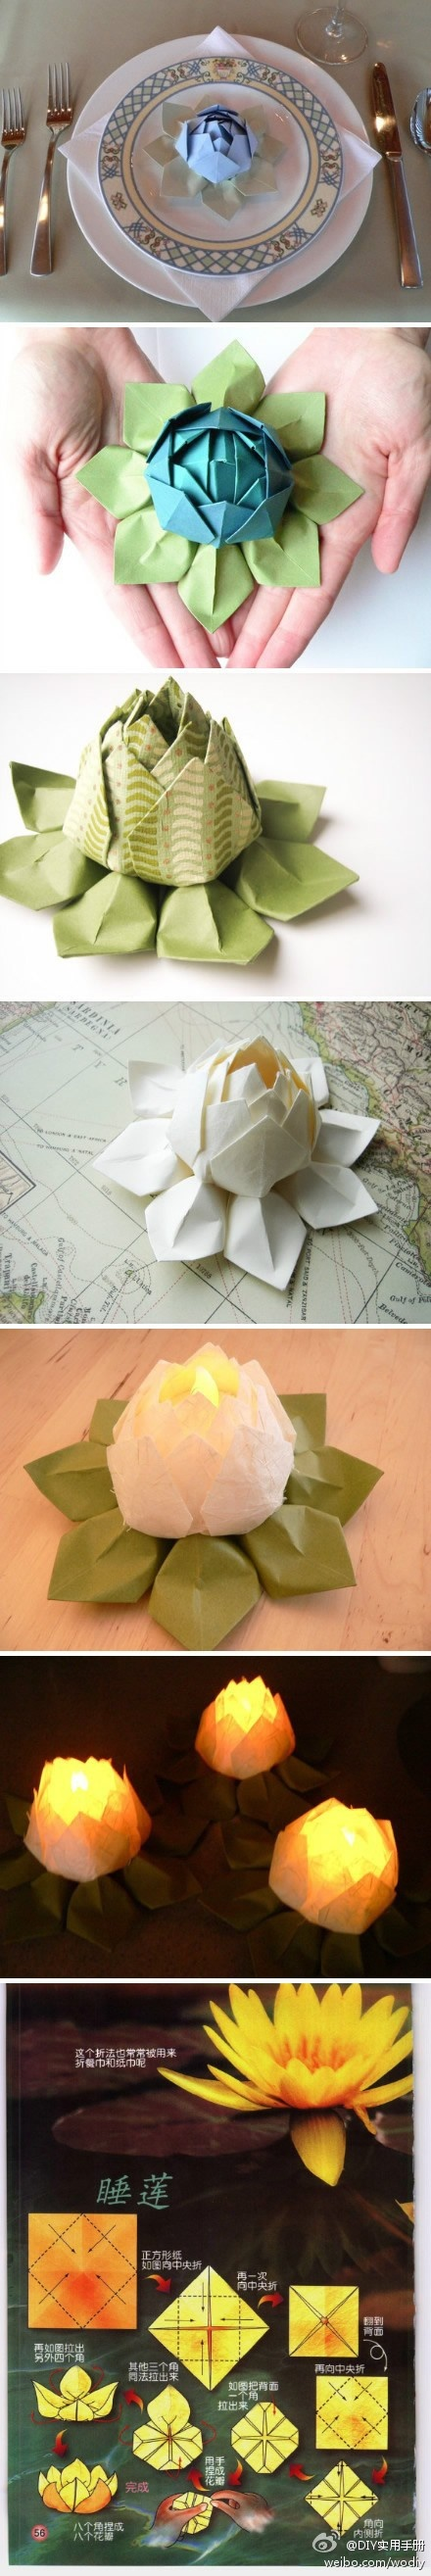 flores: Idea, Lotus Blossoms, Diy Crafts, Lotus Flowers, Teas Lights, Paper Flowers, Paper Lotus, Origami Flowers, Water Lilies